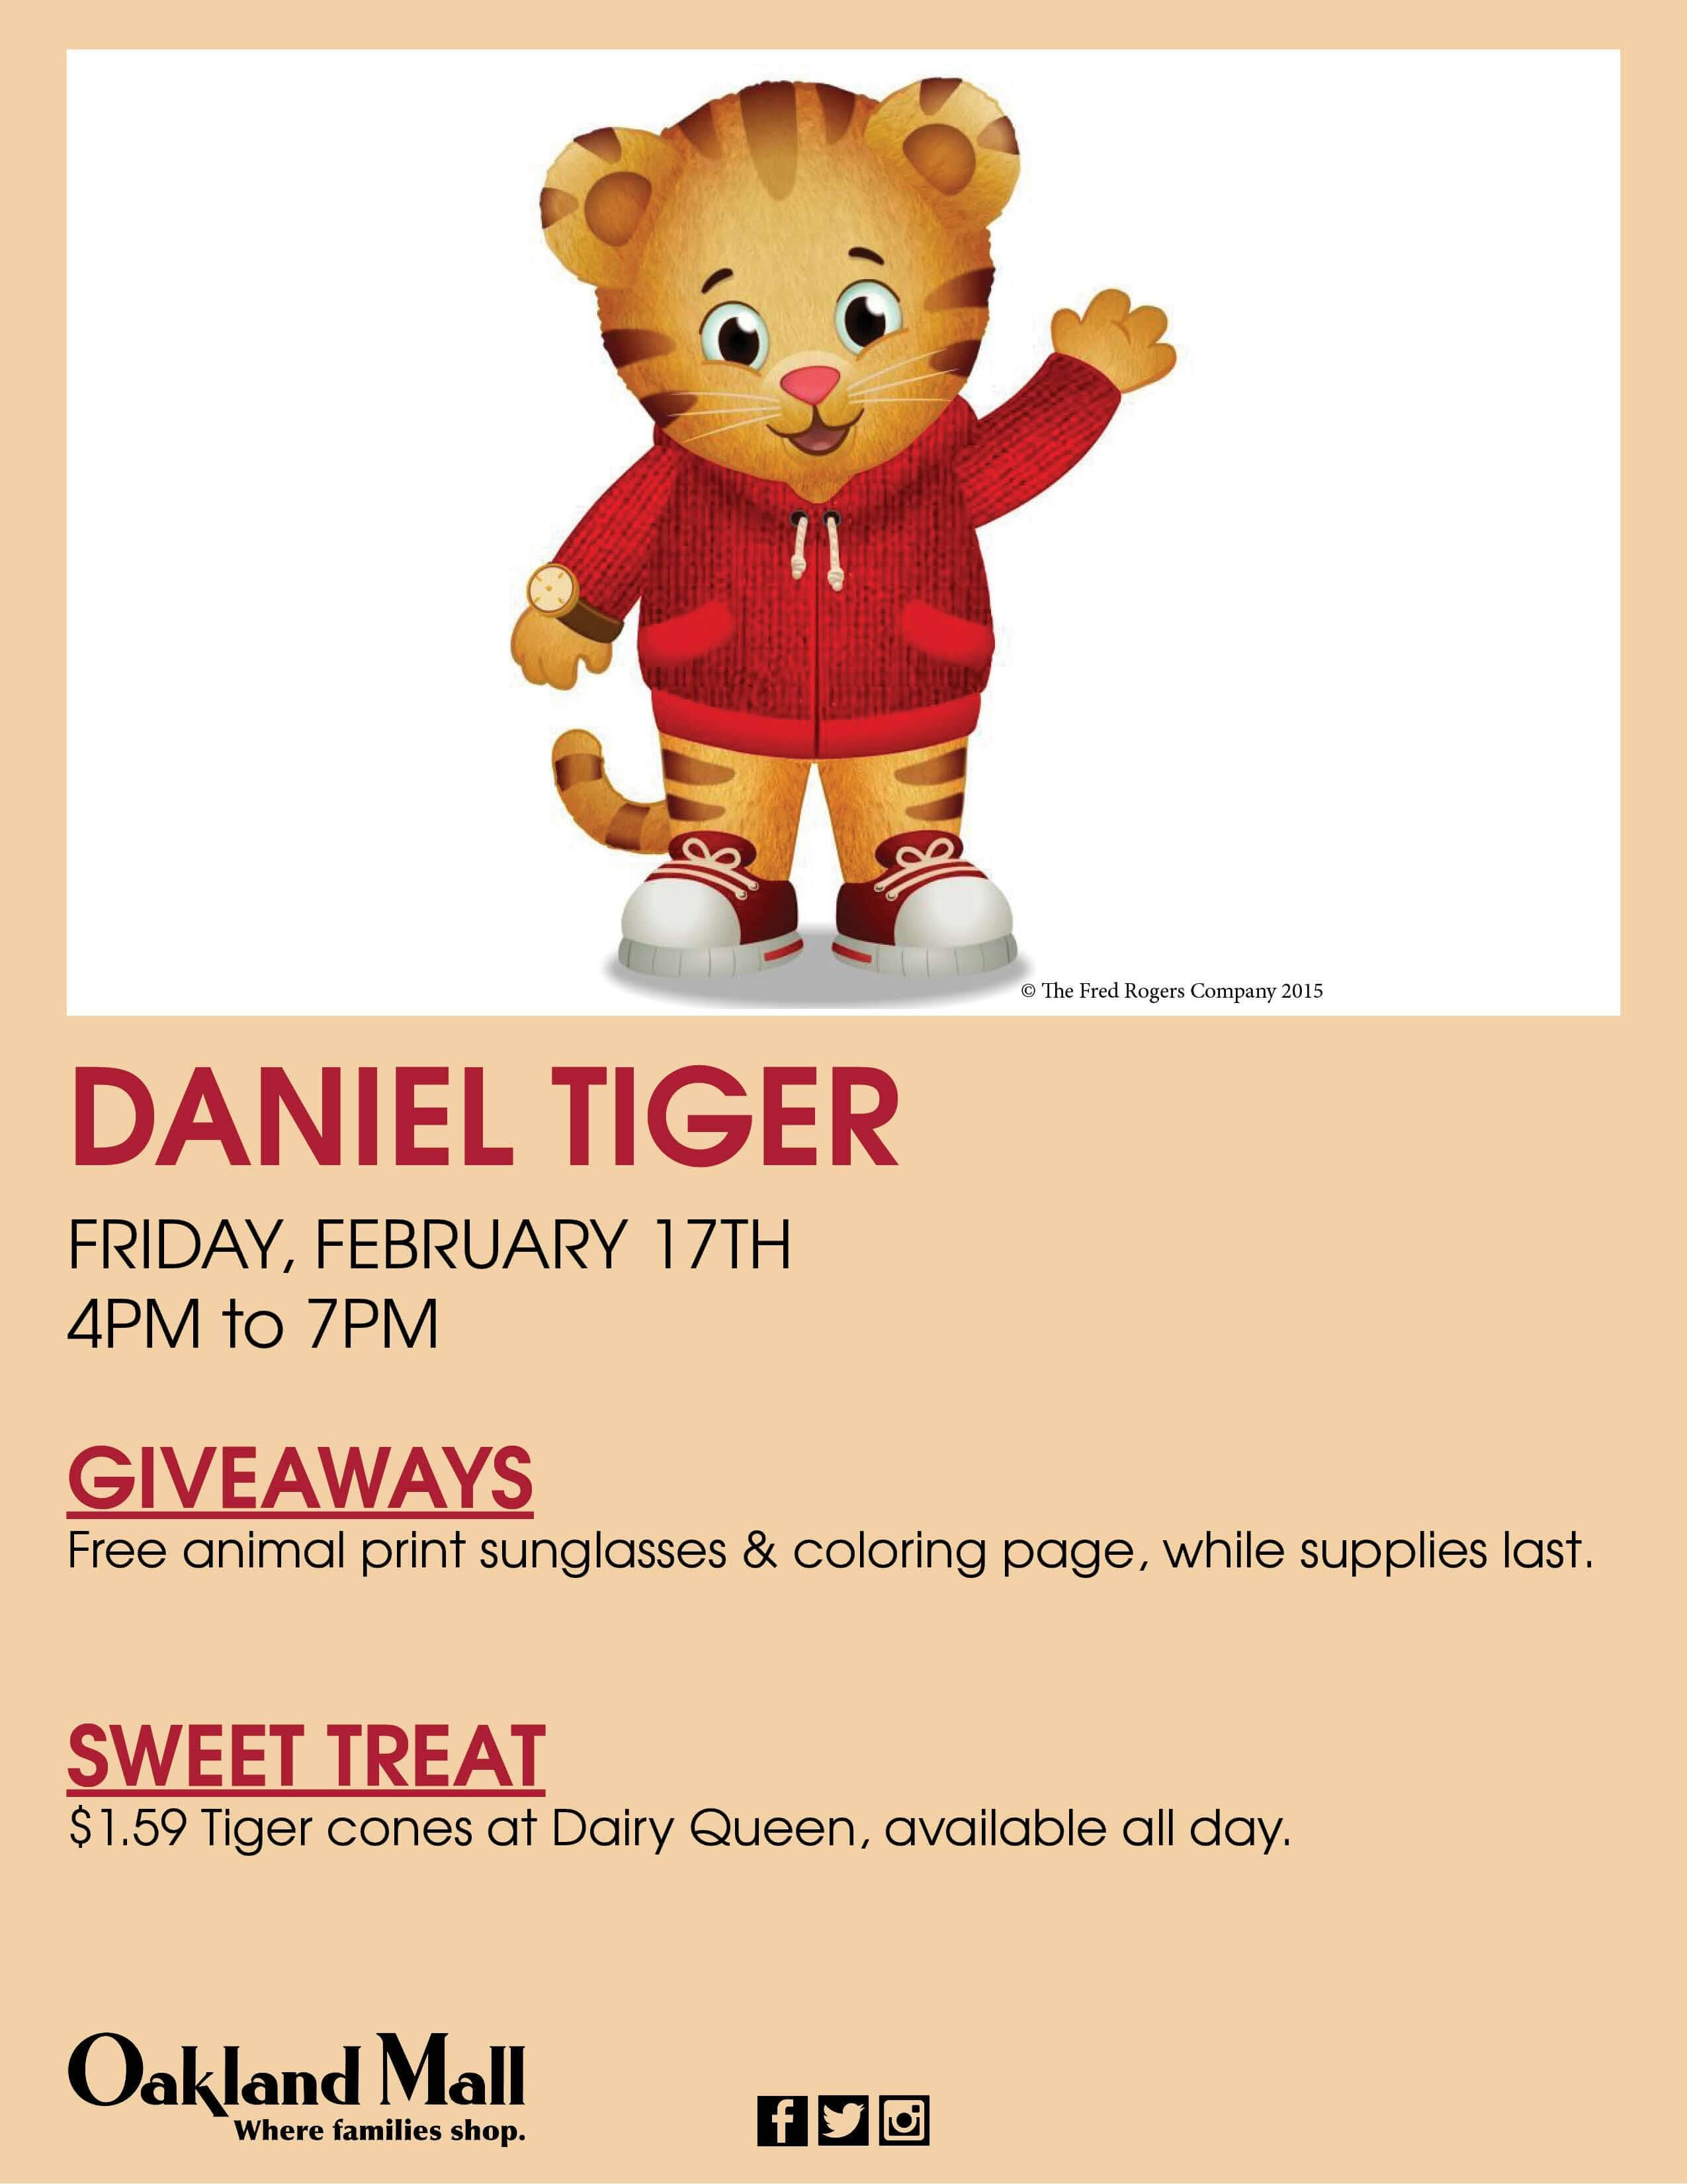 oakland mall meet daniel tiger